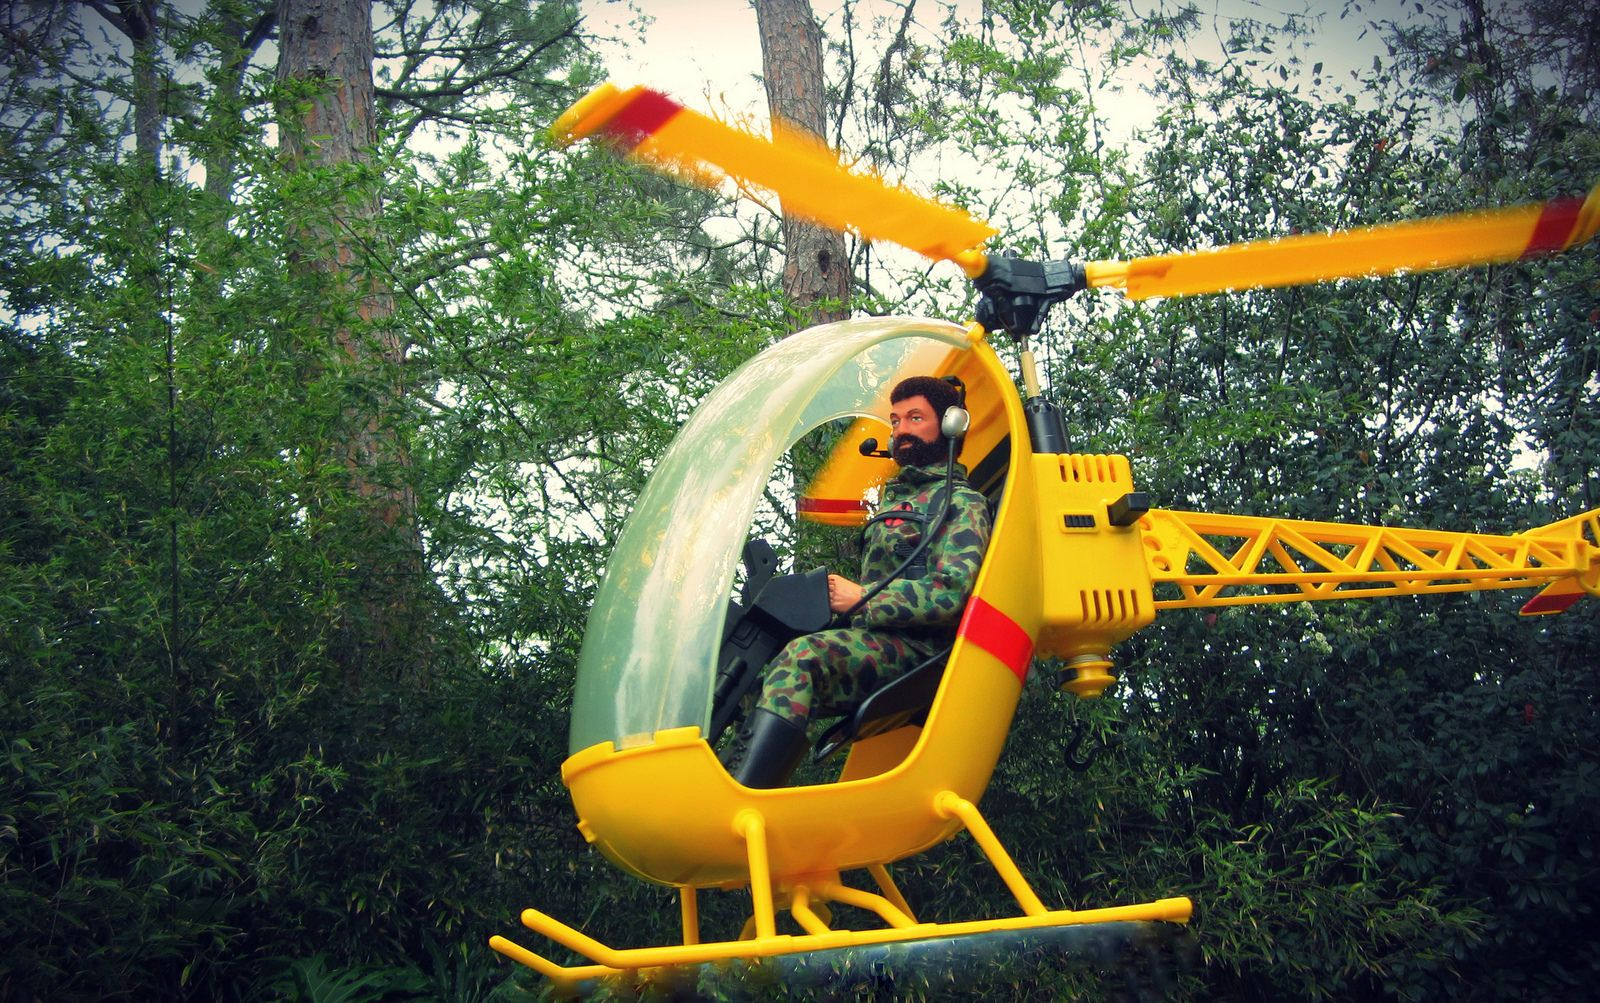 GI Joe Adventure Team Helicopter | by decobray